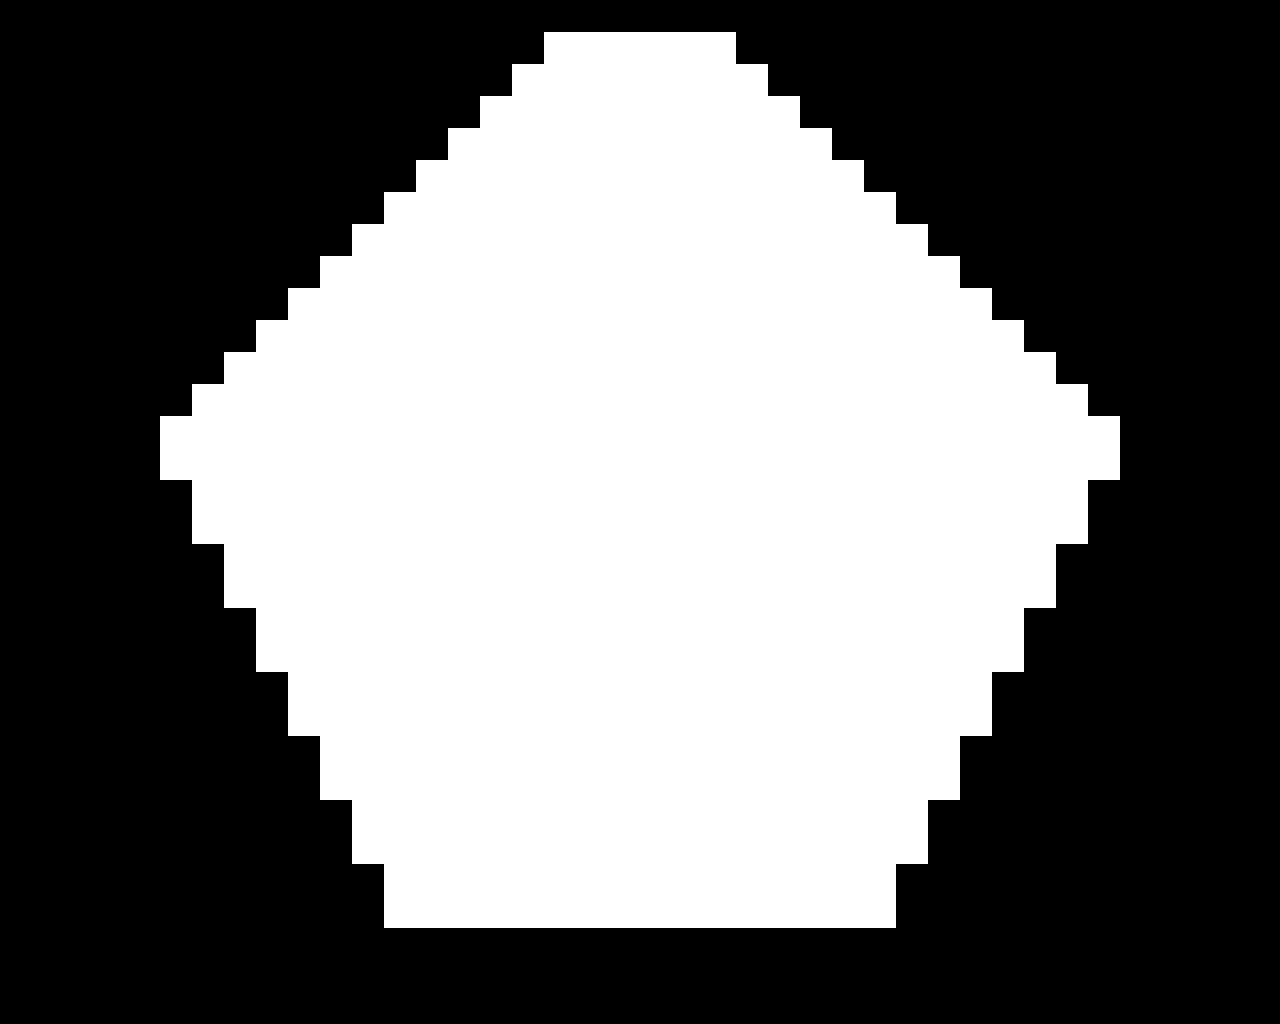 Pentagon (model)